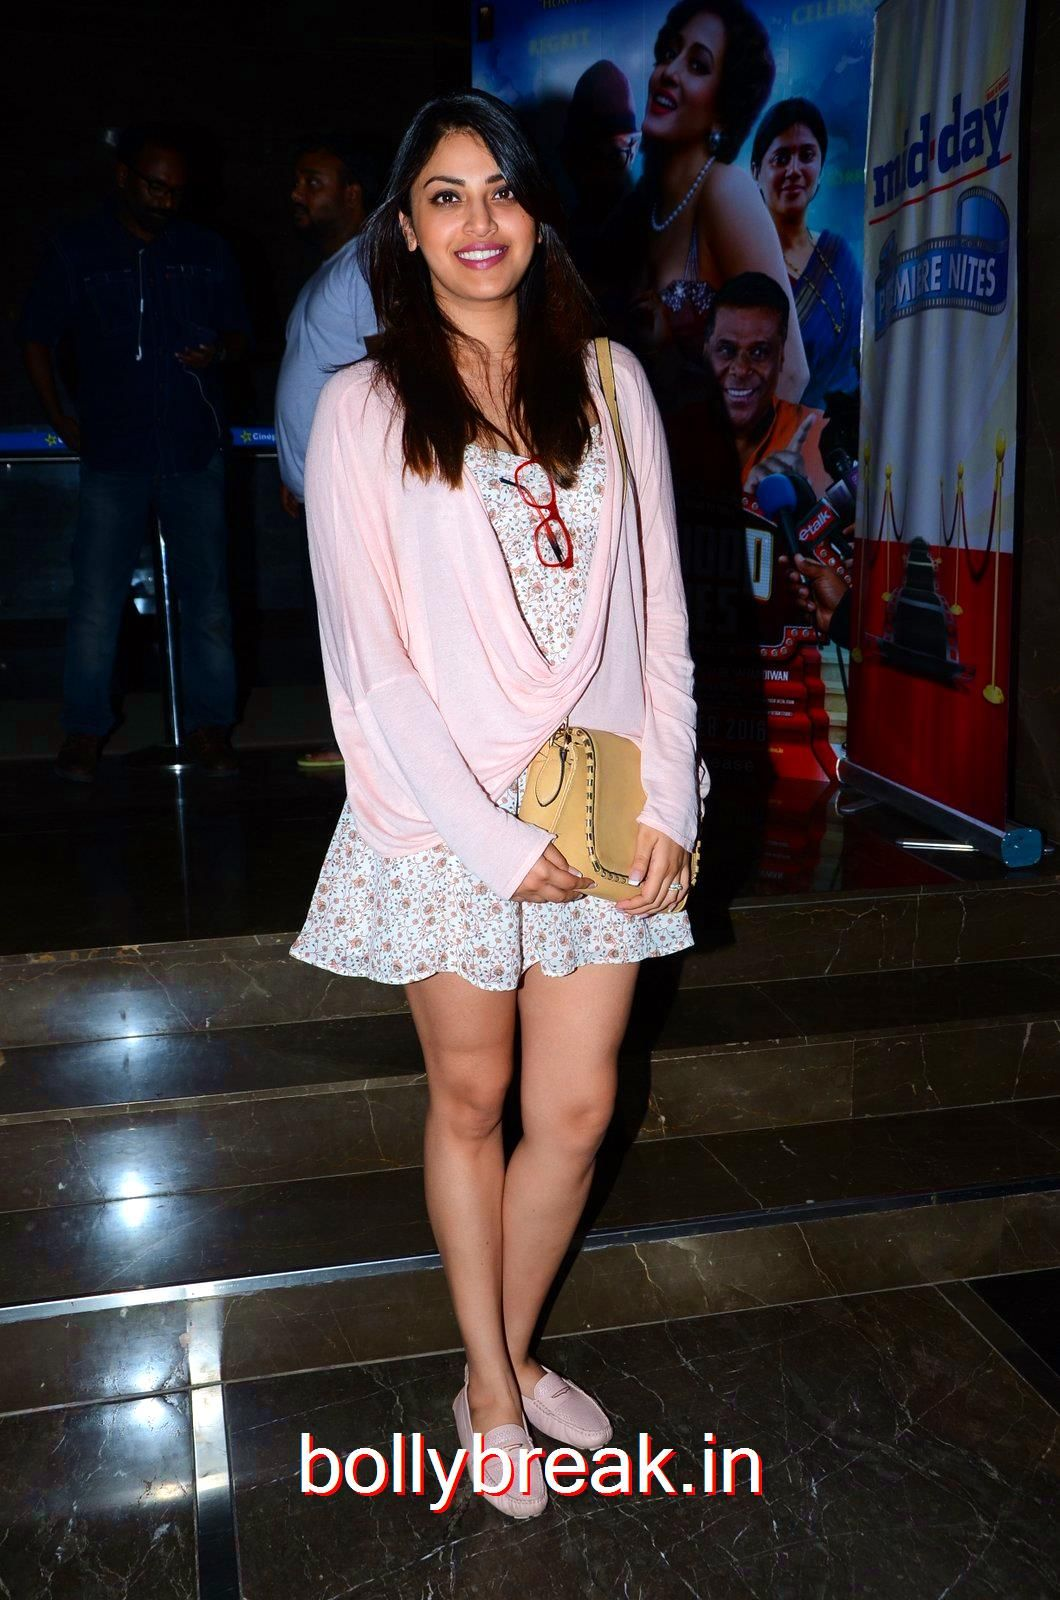 Madhu Shalini Hot Sex Ideal regina cassandra bikini, hot photos, pics, hd wallpapers, sexy